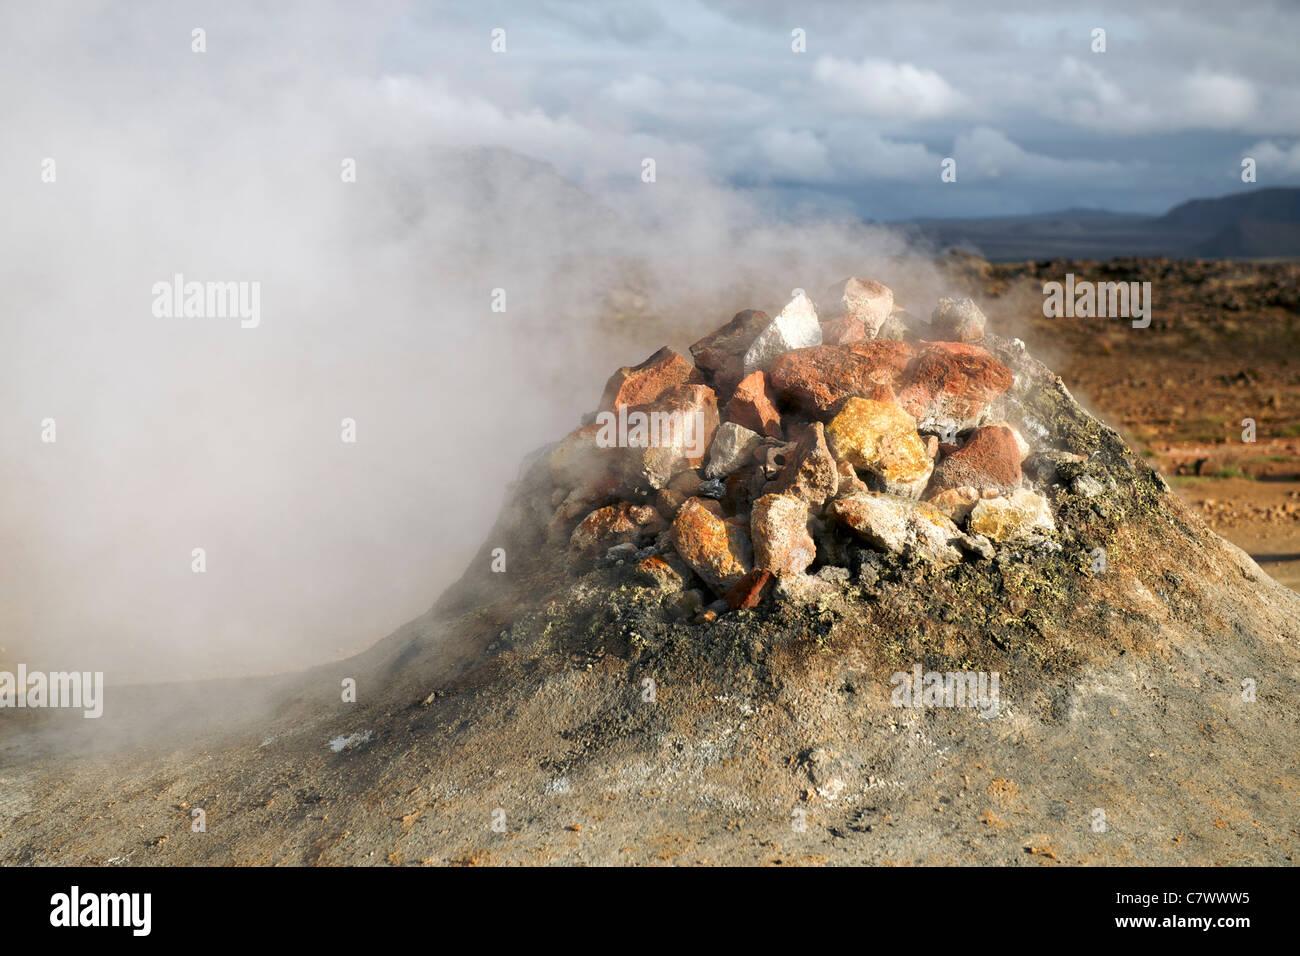 Steaming fumaroles (volcanic vents) at Hverir (aka Hverarond) east of Myvatn in northeast Iceland. - Stock Image